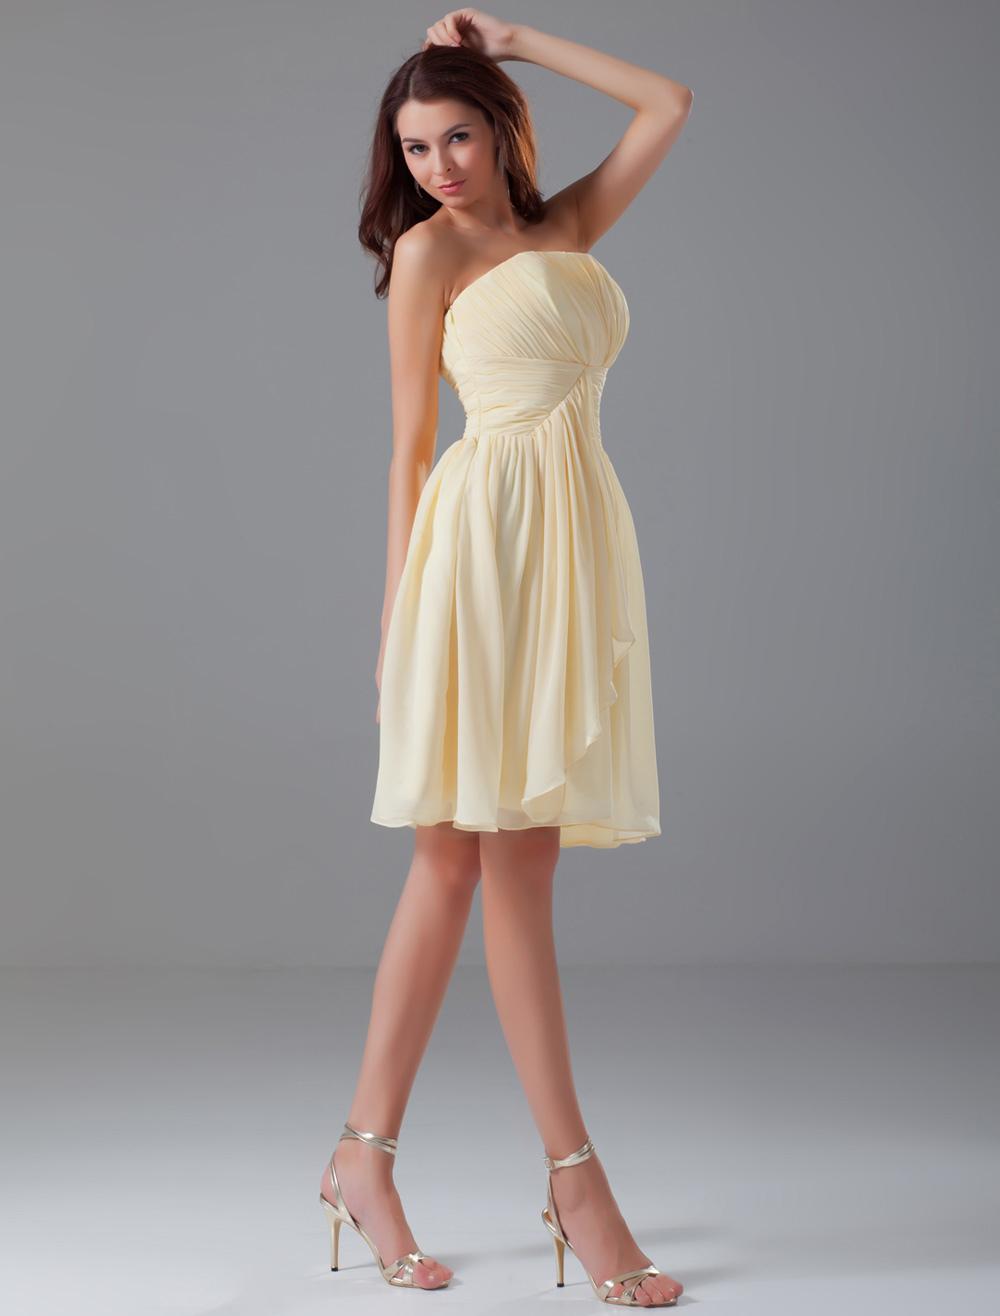 Strapless Knee Length Chiffon Bridesmaid Dresses